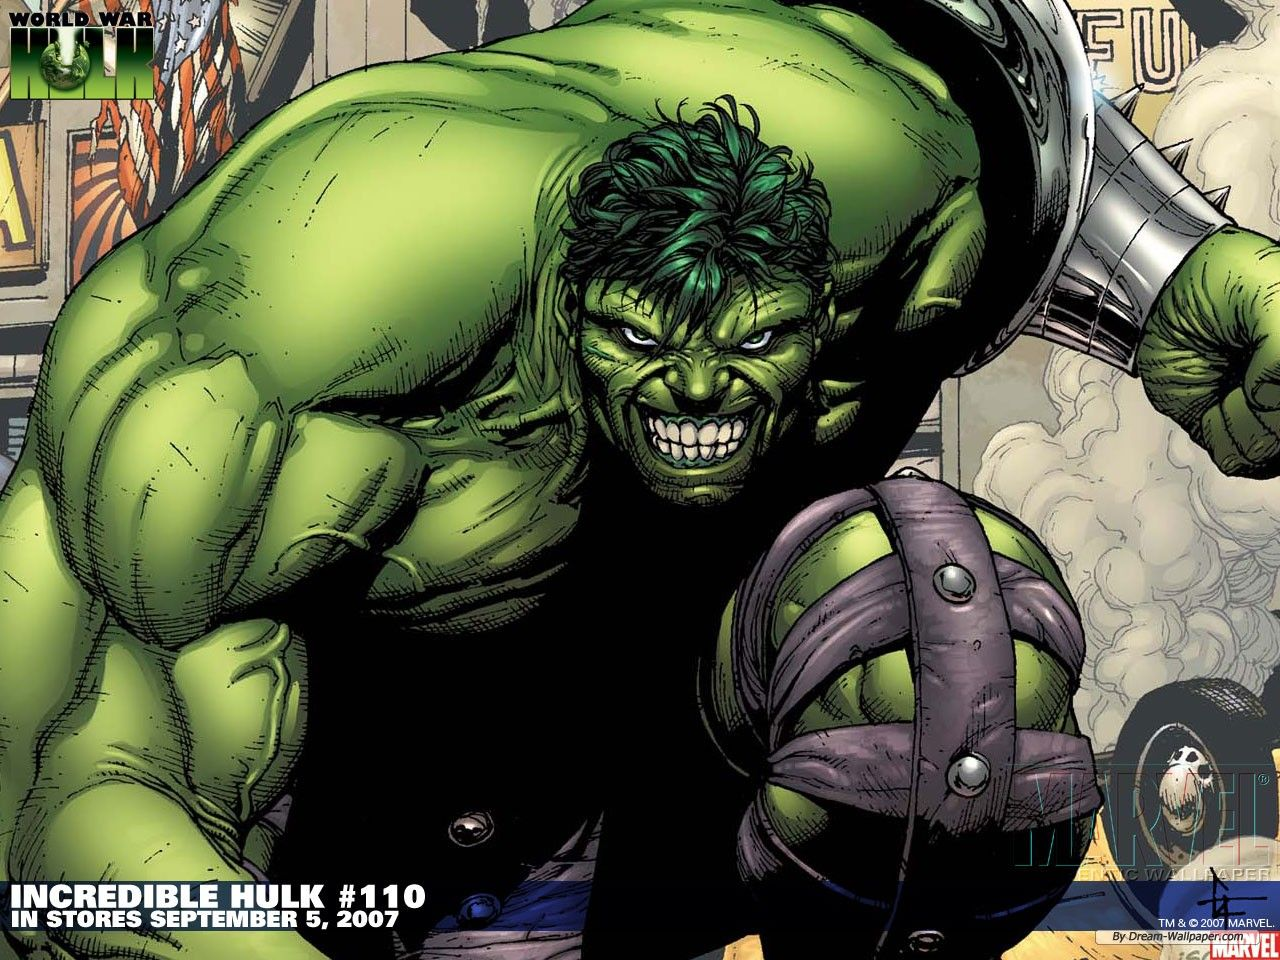 Cool Wallpaper Marvel The Incredible Hulk - e993268b128f2fedb1dddc8f73fbd929  Gallery_13534.jpg